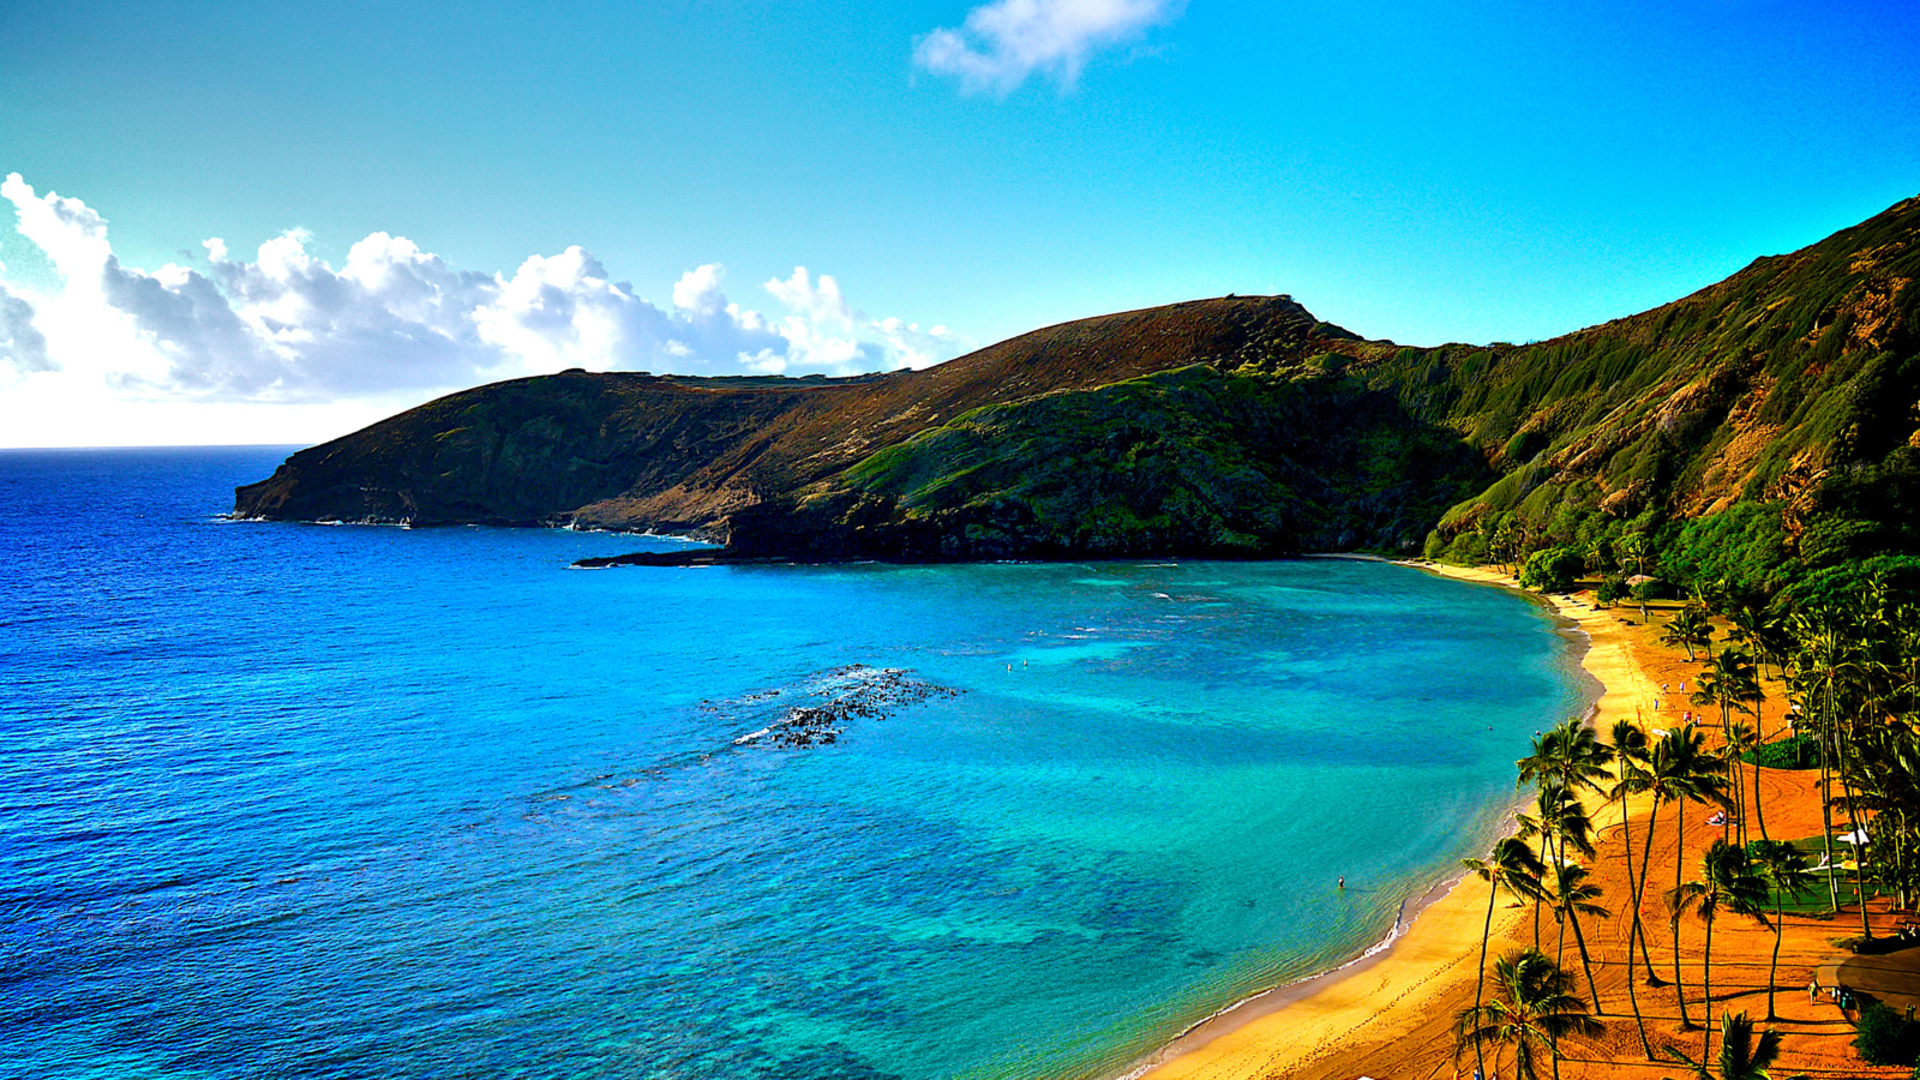 Hawaii Beach #8